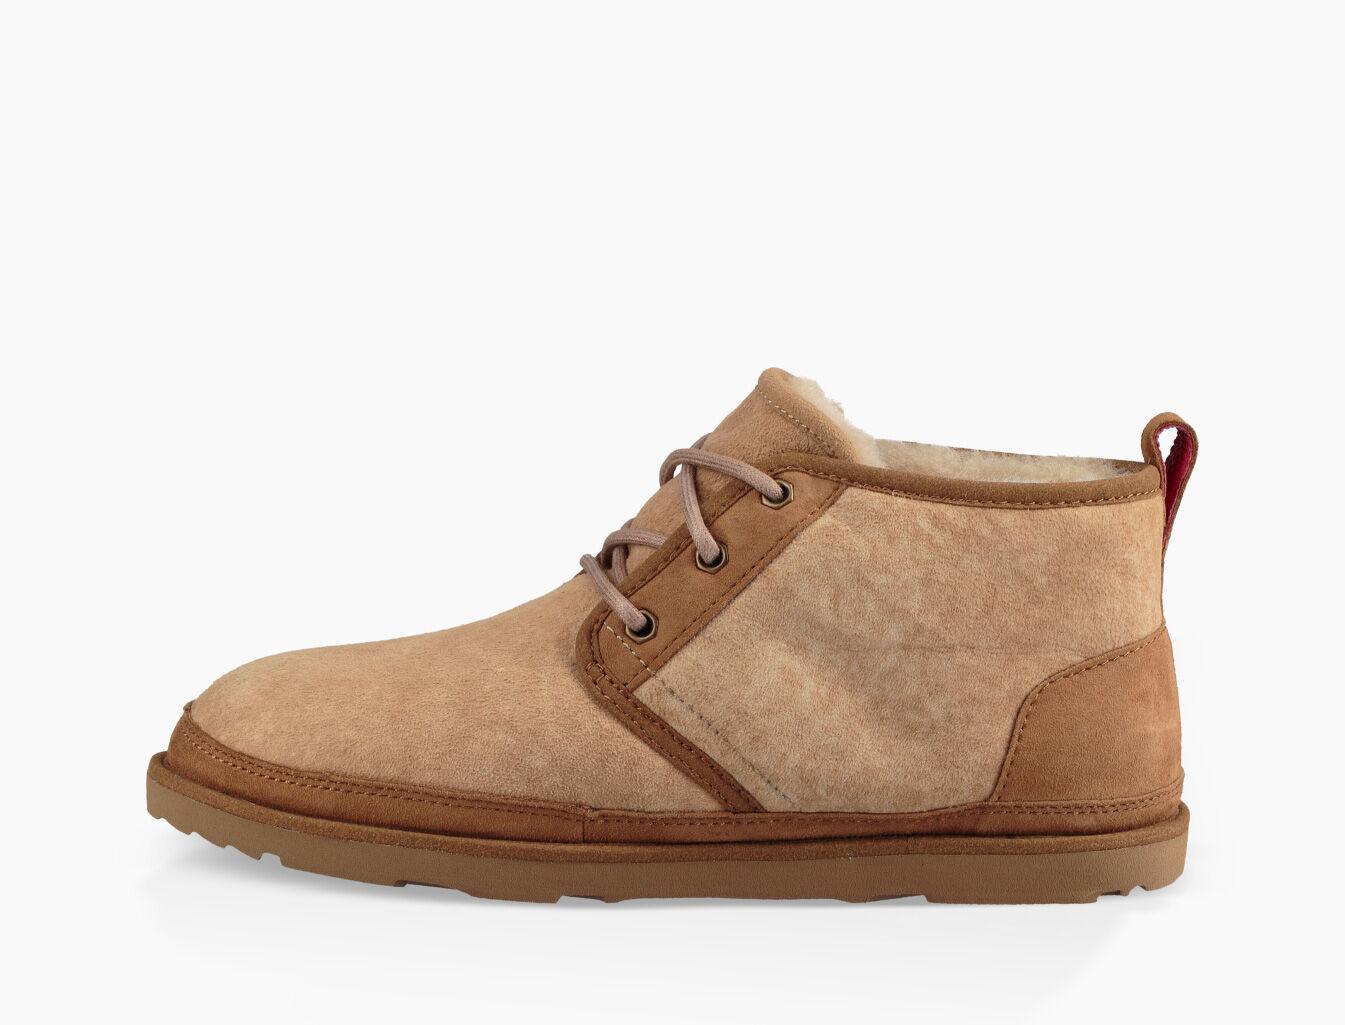 Free Shipping Manchester UGG Neumel Twinface Chukka Boot(Men's) -Slate Twinface Free Shipping Choice xN4PtQ